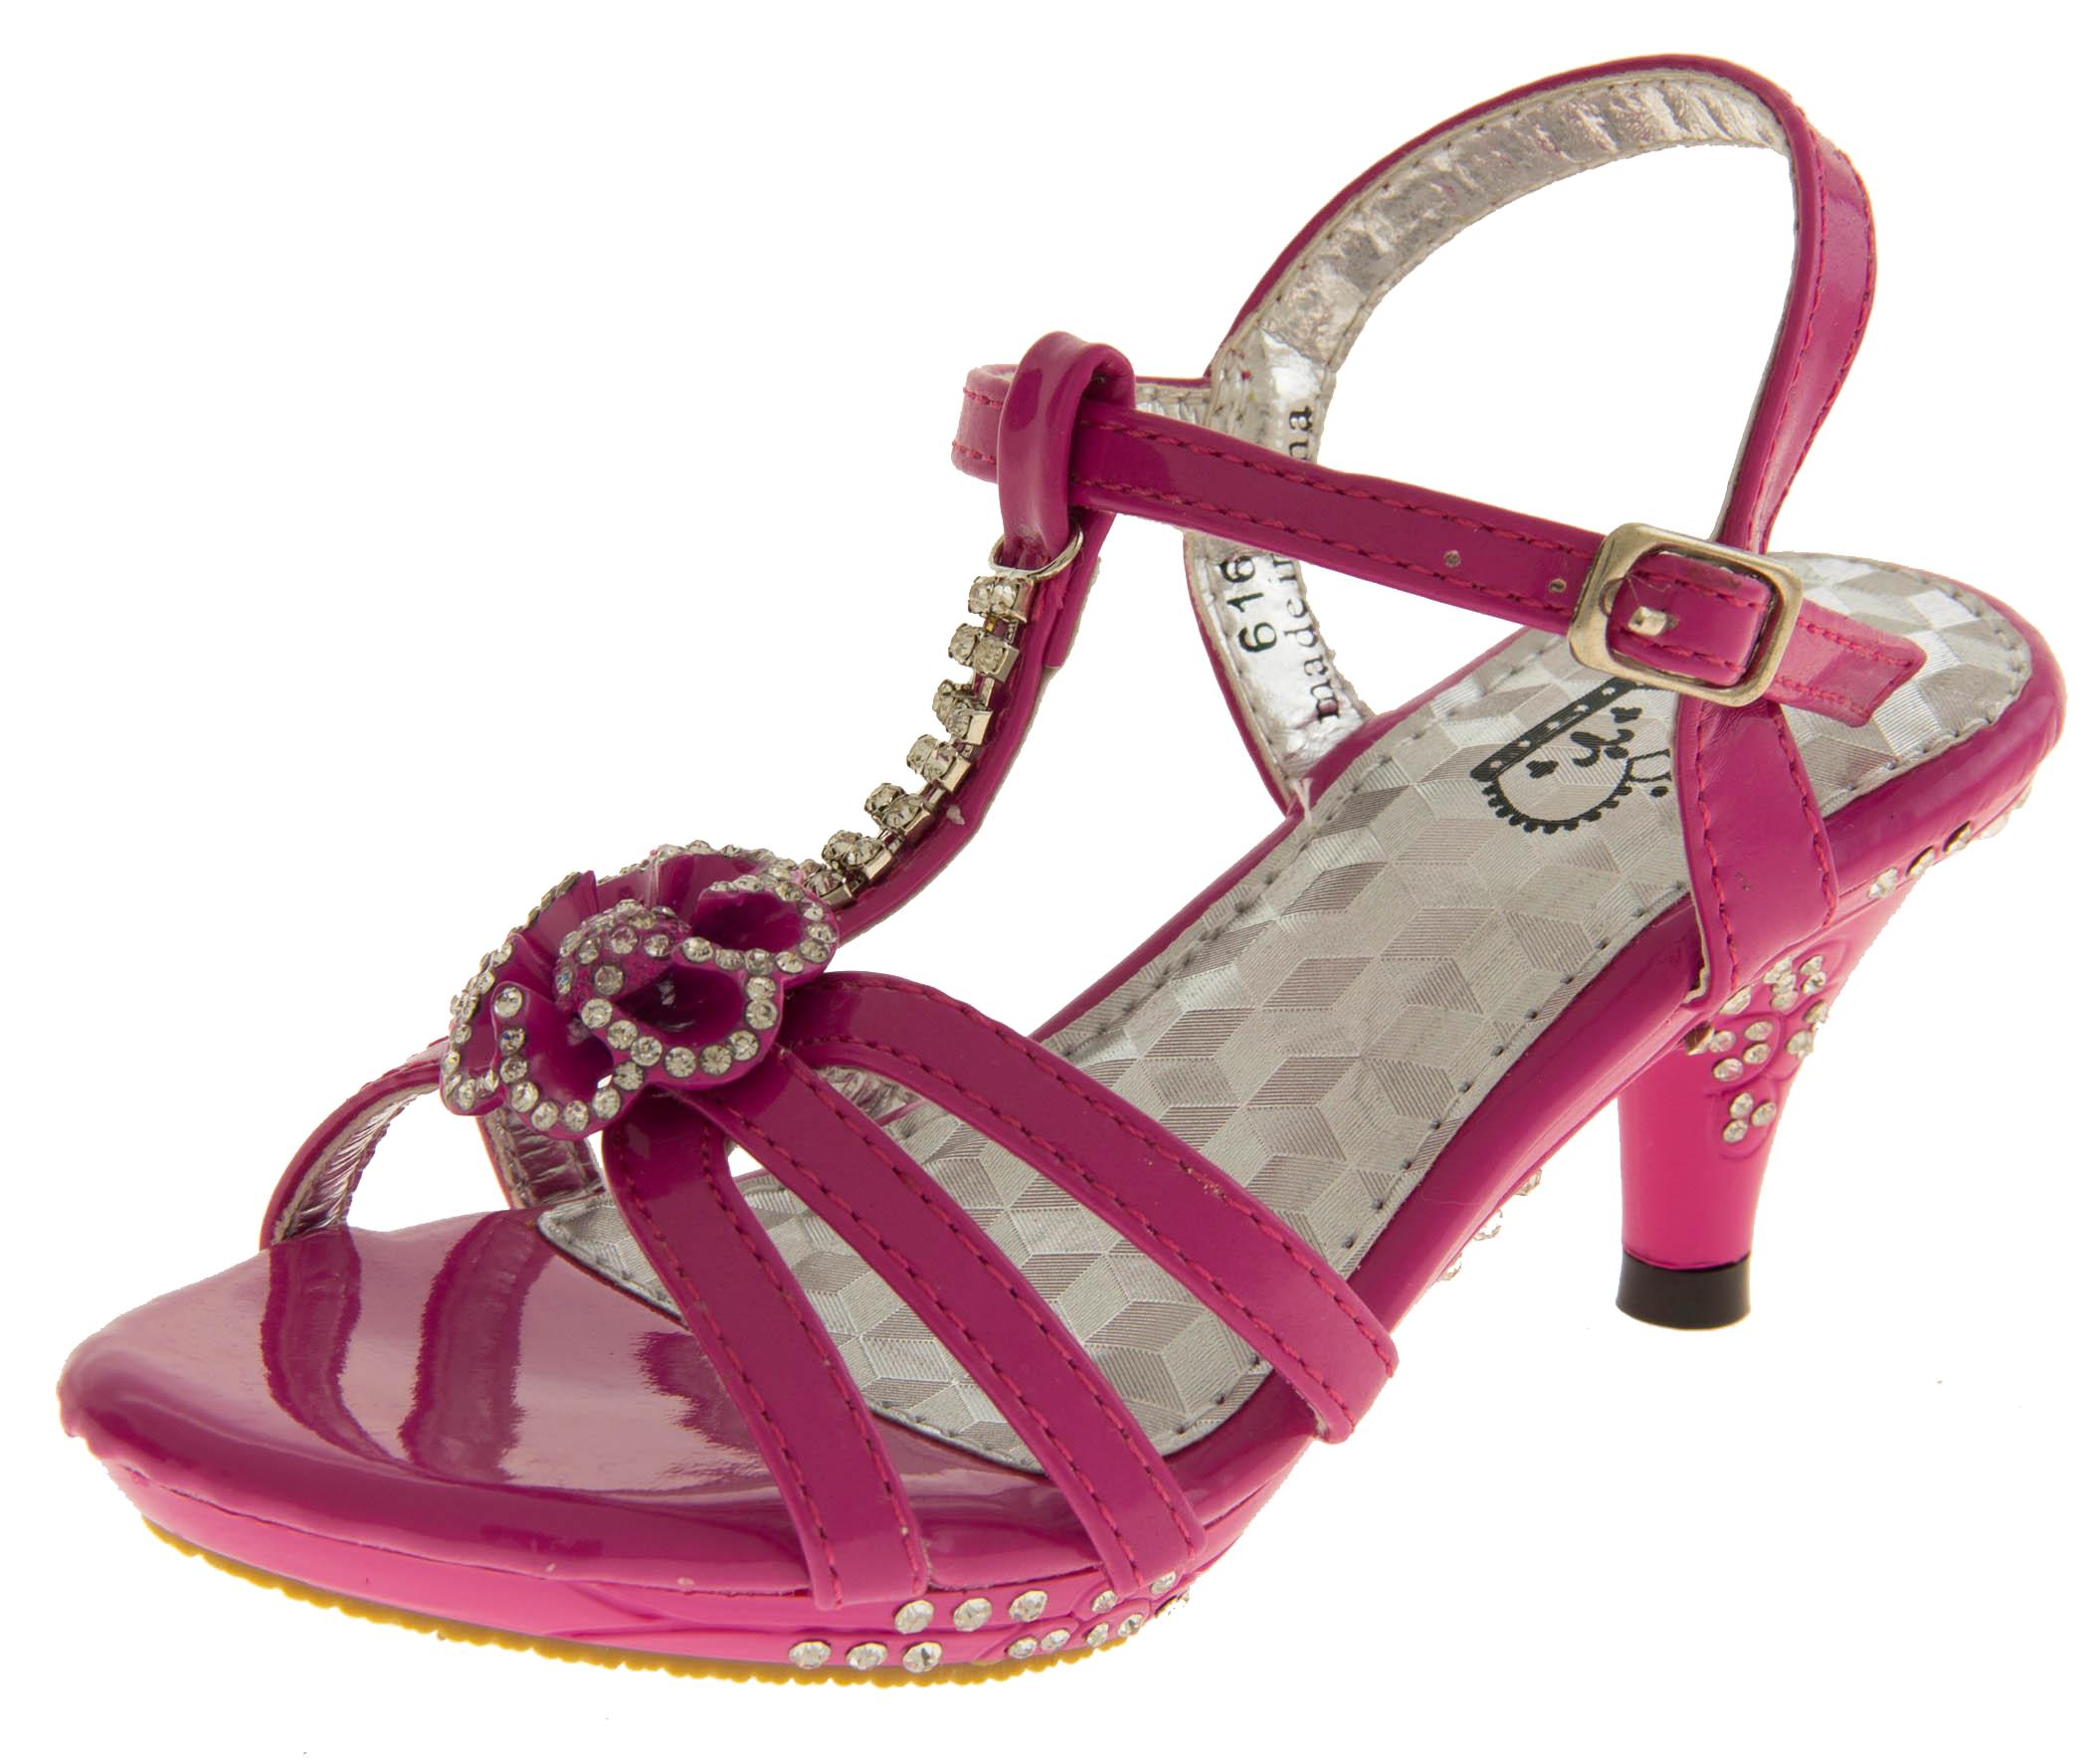 Girls Kids Pink Party Low Heel Wedding Heels Shoes Size 8 9 10 11 ...